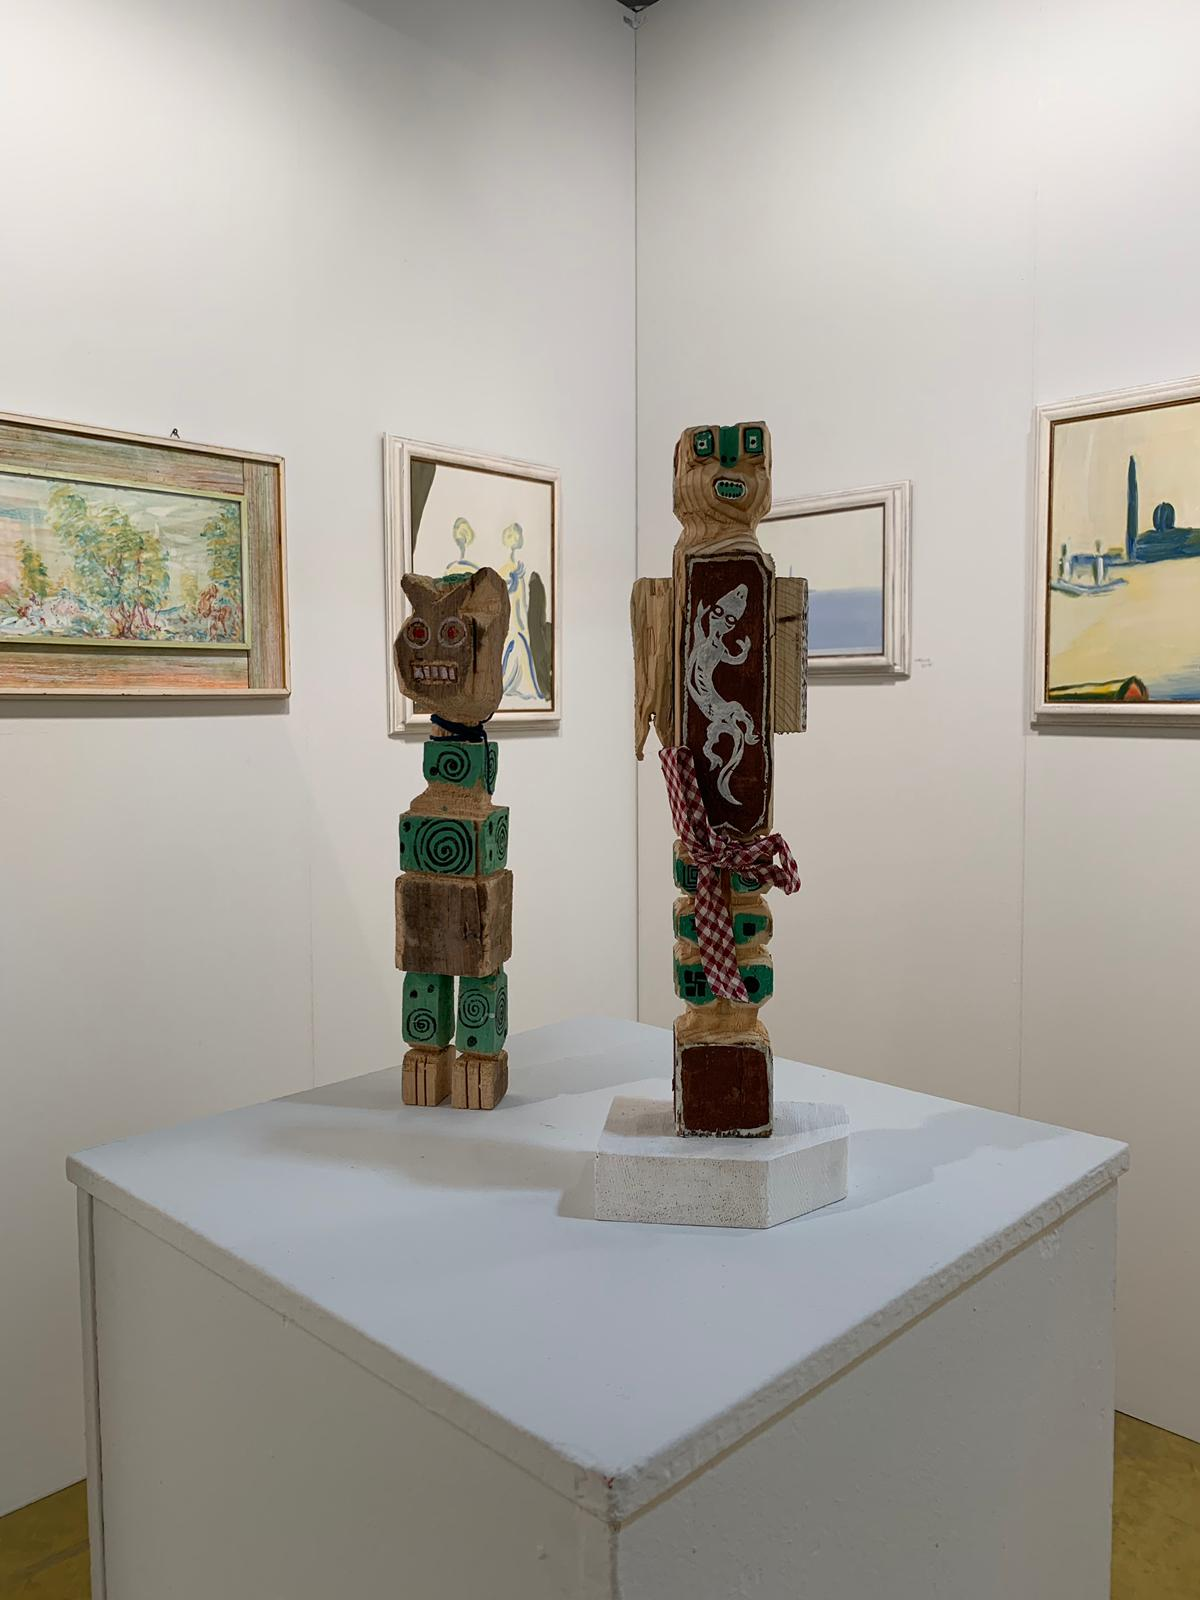 Arte Parma 2019: Filippo Biagioli, Virgilio Guidi, Orfeo Tamburi, Aligi Sassu alla galleria Enrico Art Suite